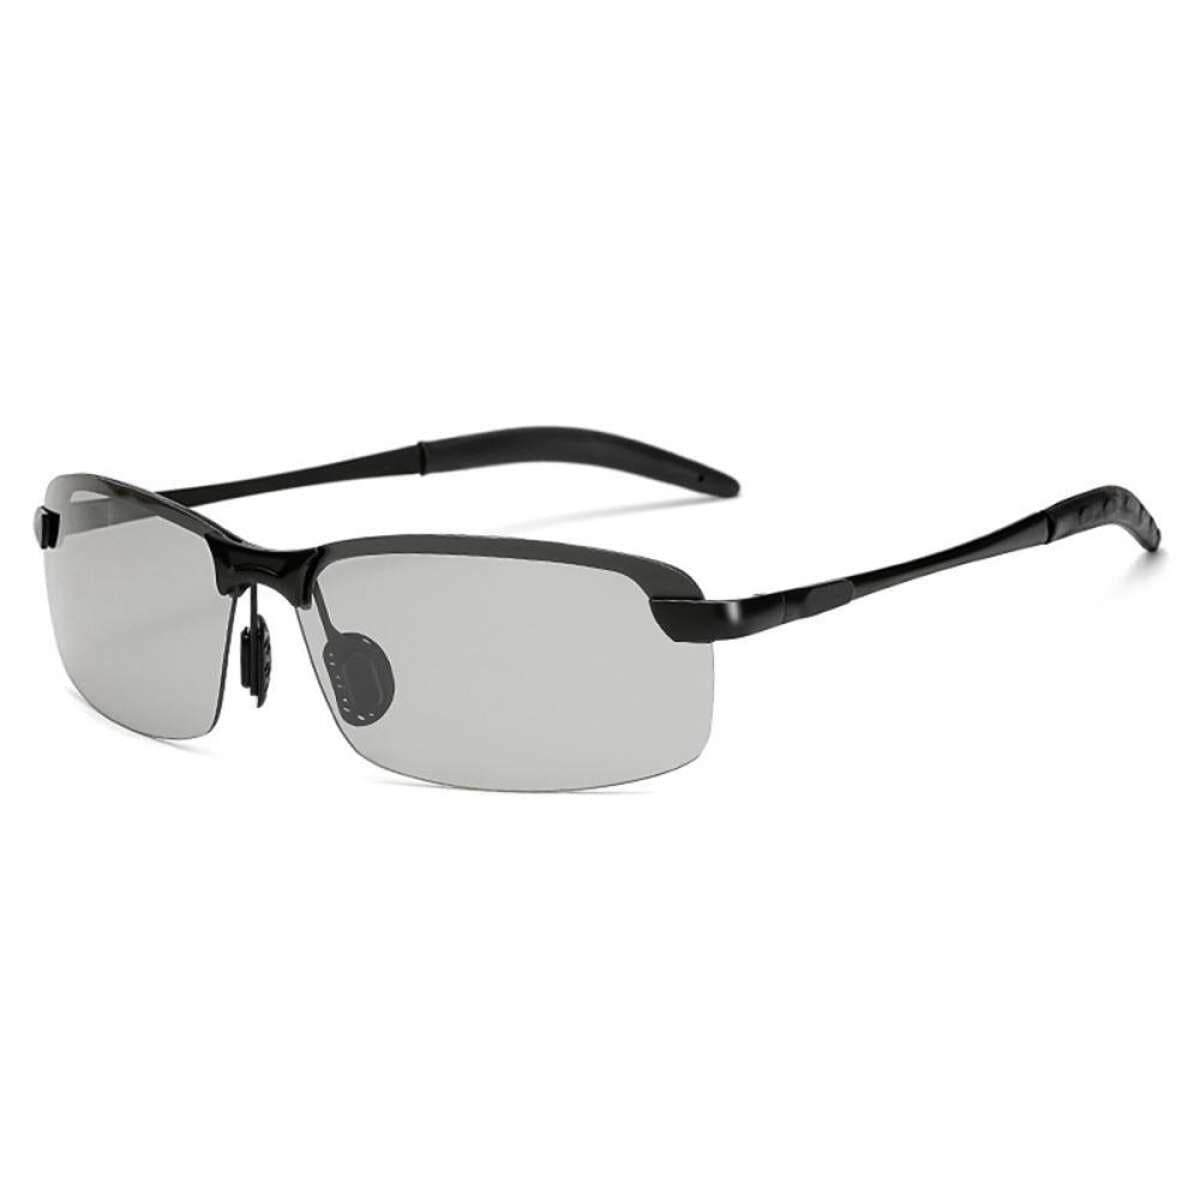 Best แว่นกันแดดคุณภาพดี เลนส์เปลี่ยนสี ป้องกันรังสีuv ออกแดด เปลี่ยนสีใน30วินาที เหมาะสำหรับการใส่ขับรถ (เลนส์สีเทาอ่อนเปลี่ยนเป็นเทาเข้ม).